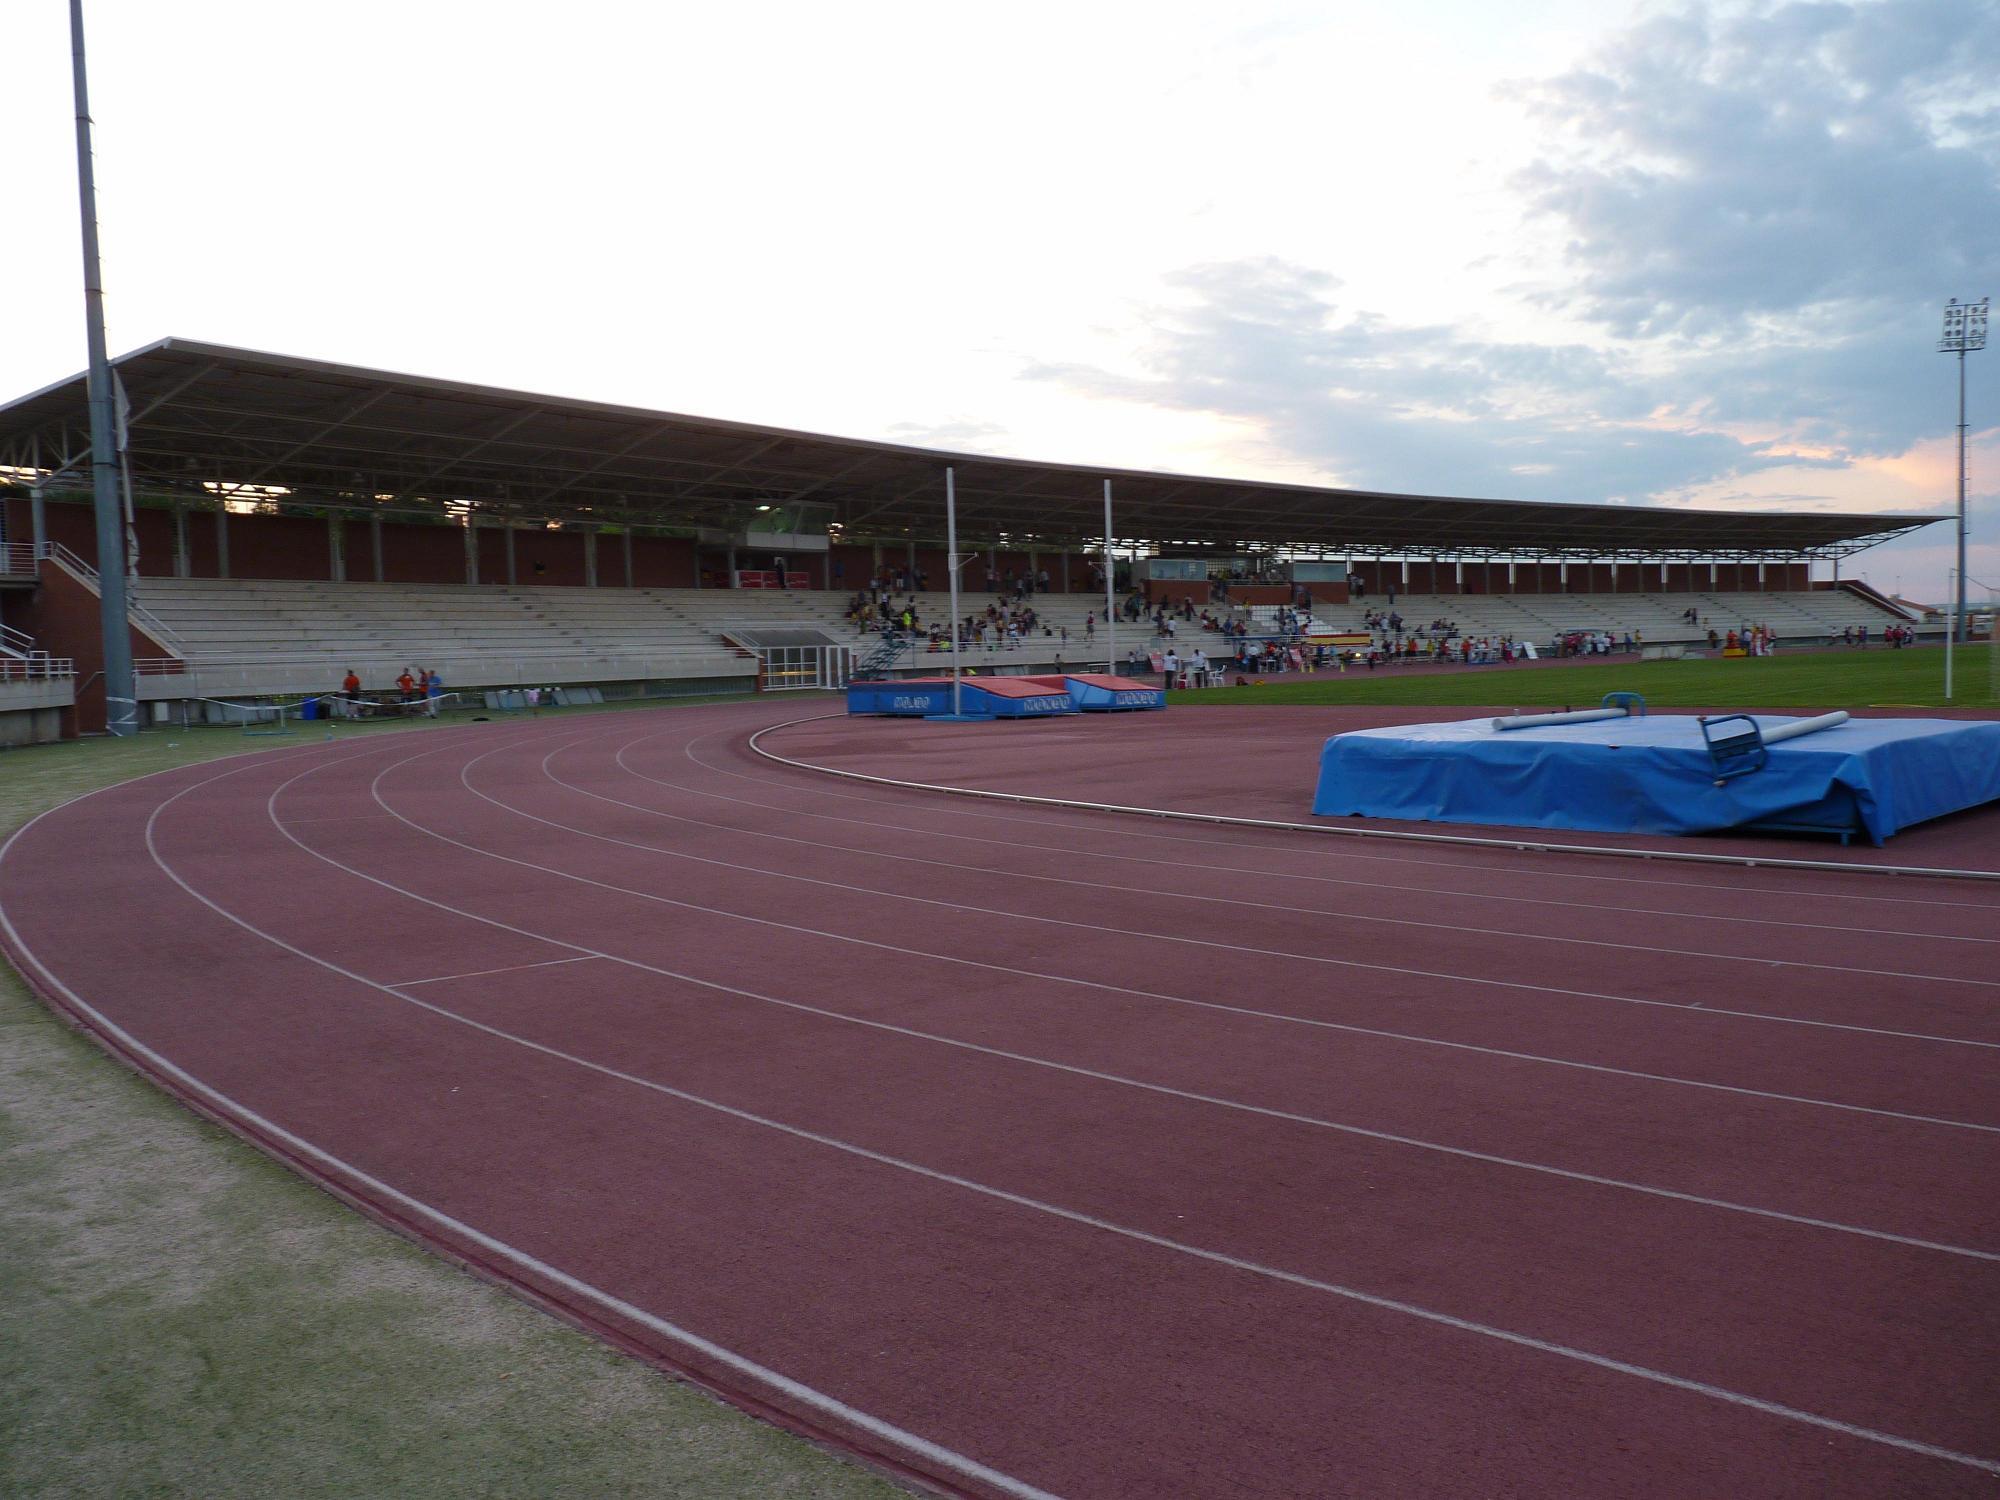 Polideportivo Municipal El Deleite